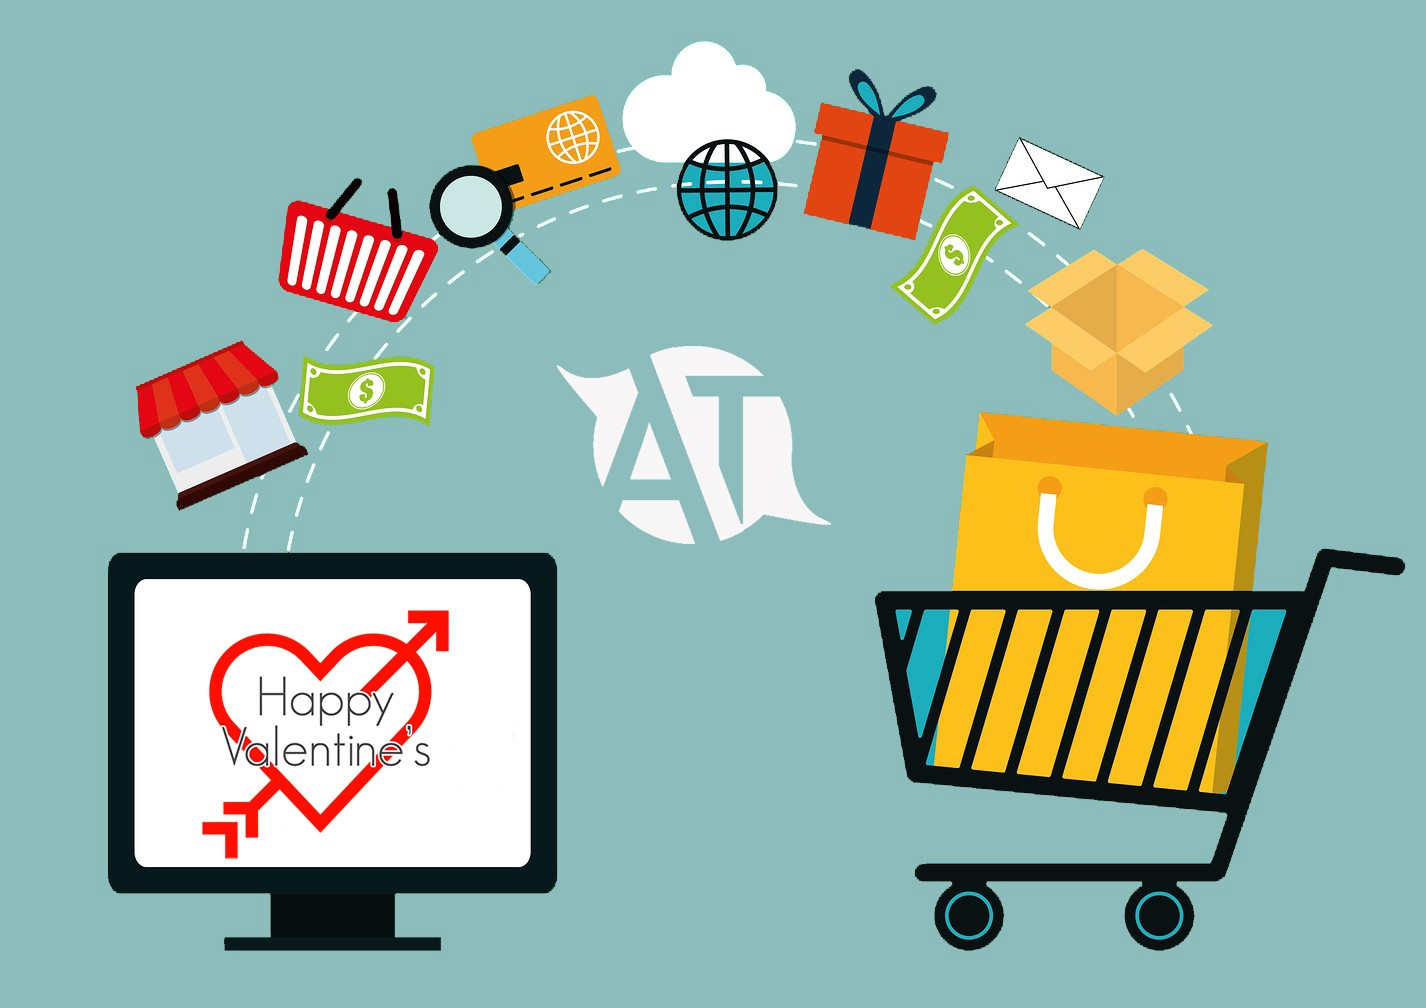 ¿Ya tienes listo tu e-commerce para San Valentín?